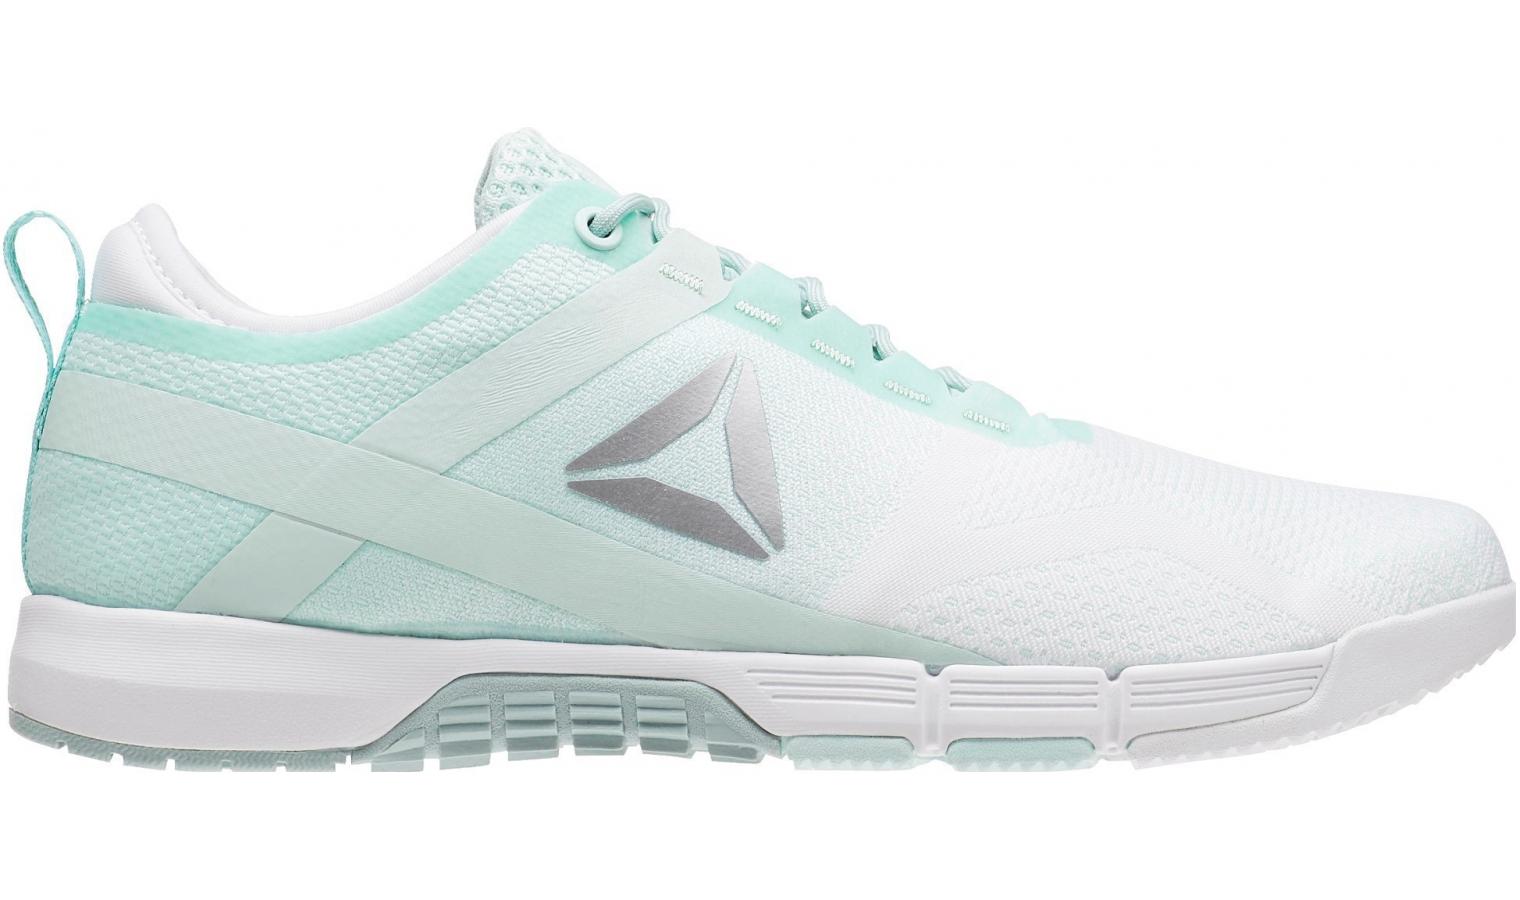 b5d3b97ec54 ... Tréninkové · Dámské boty na CrossFit Reebok CROSSFIT GRACE bílé. Sleva